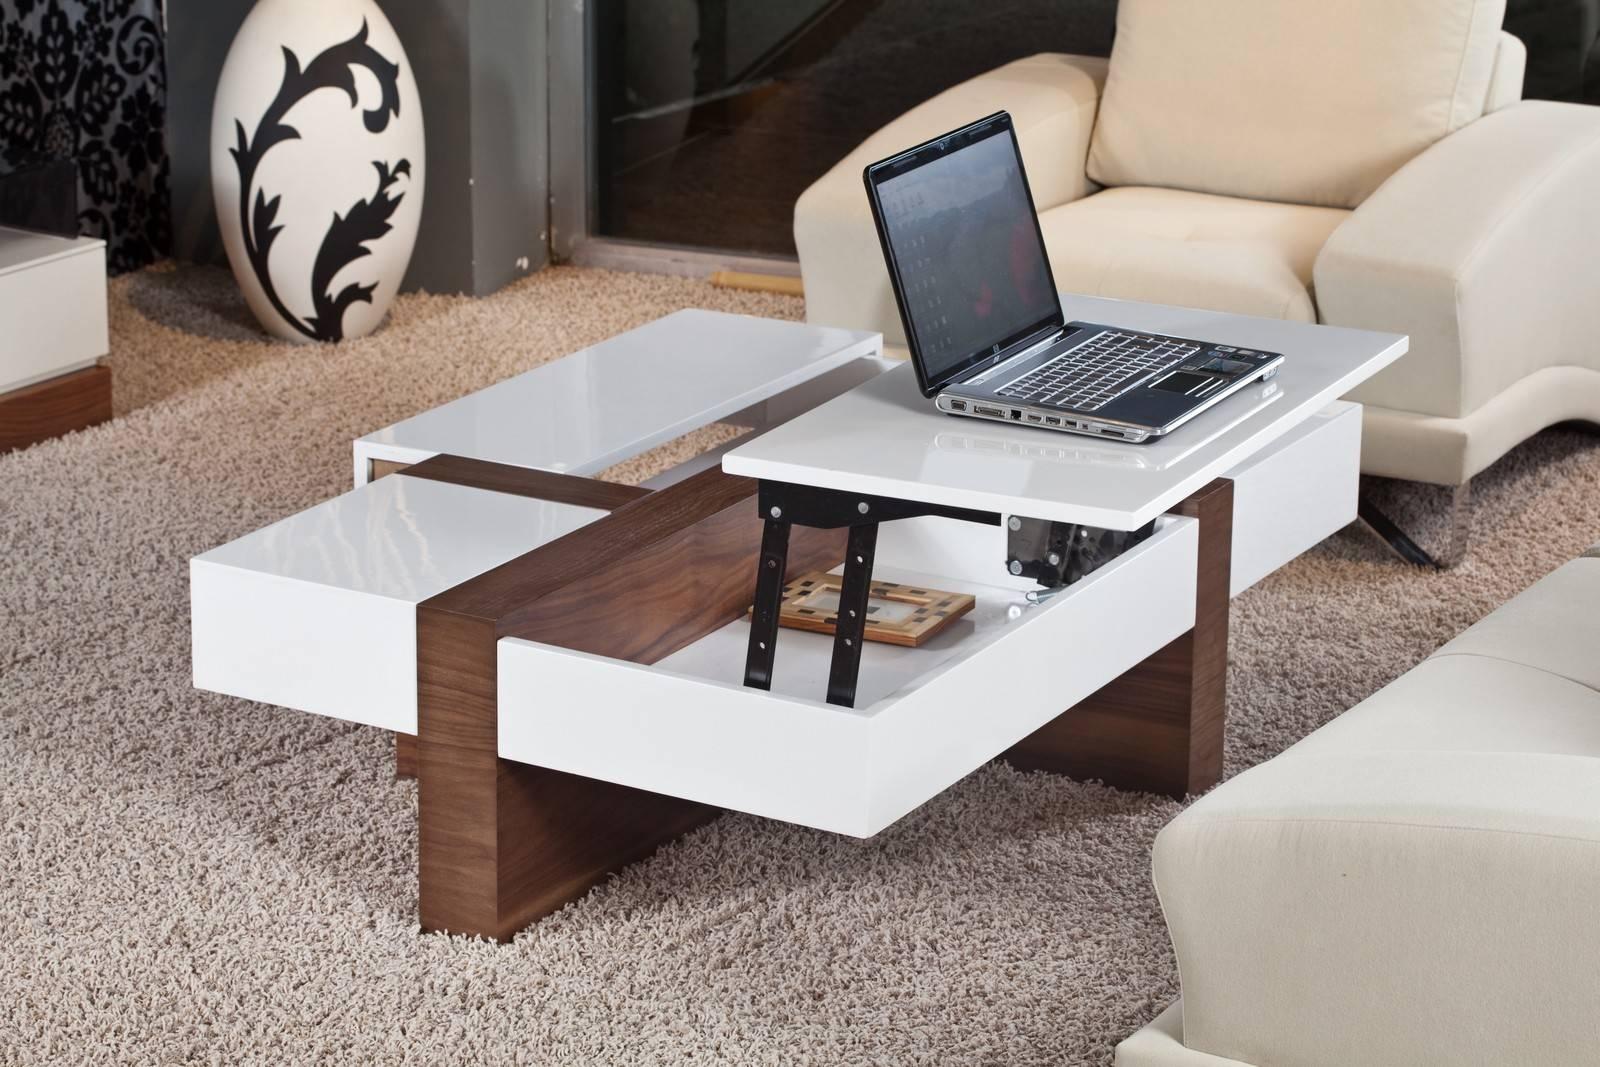 Slender Modern Lift Top Storage Coffee Table | Coffee Tables intended for Coffee Tables With Lift Top Storage (Image 27 of 30)